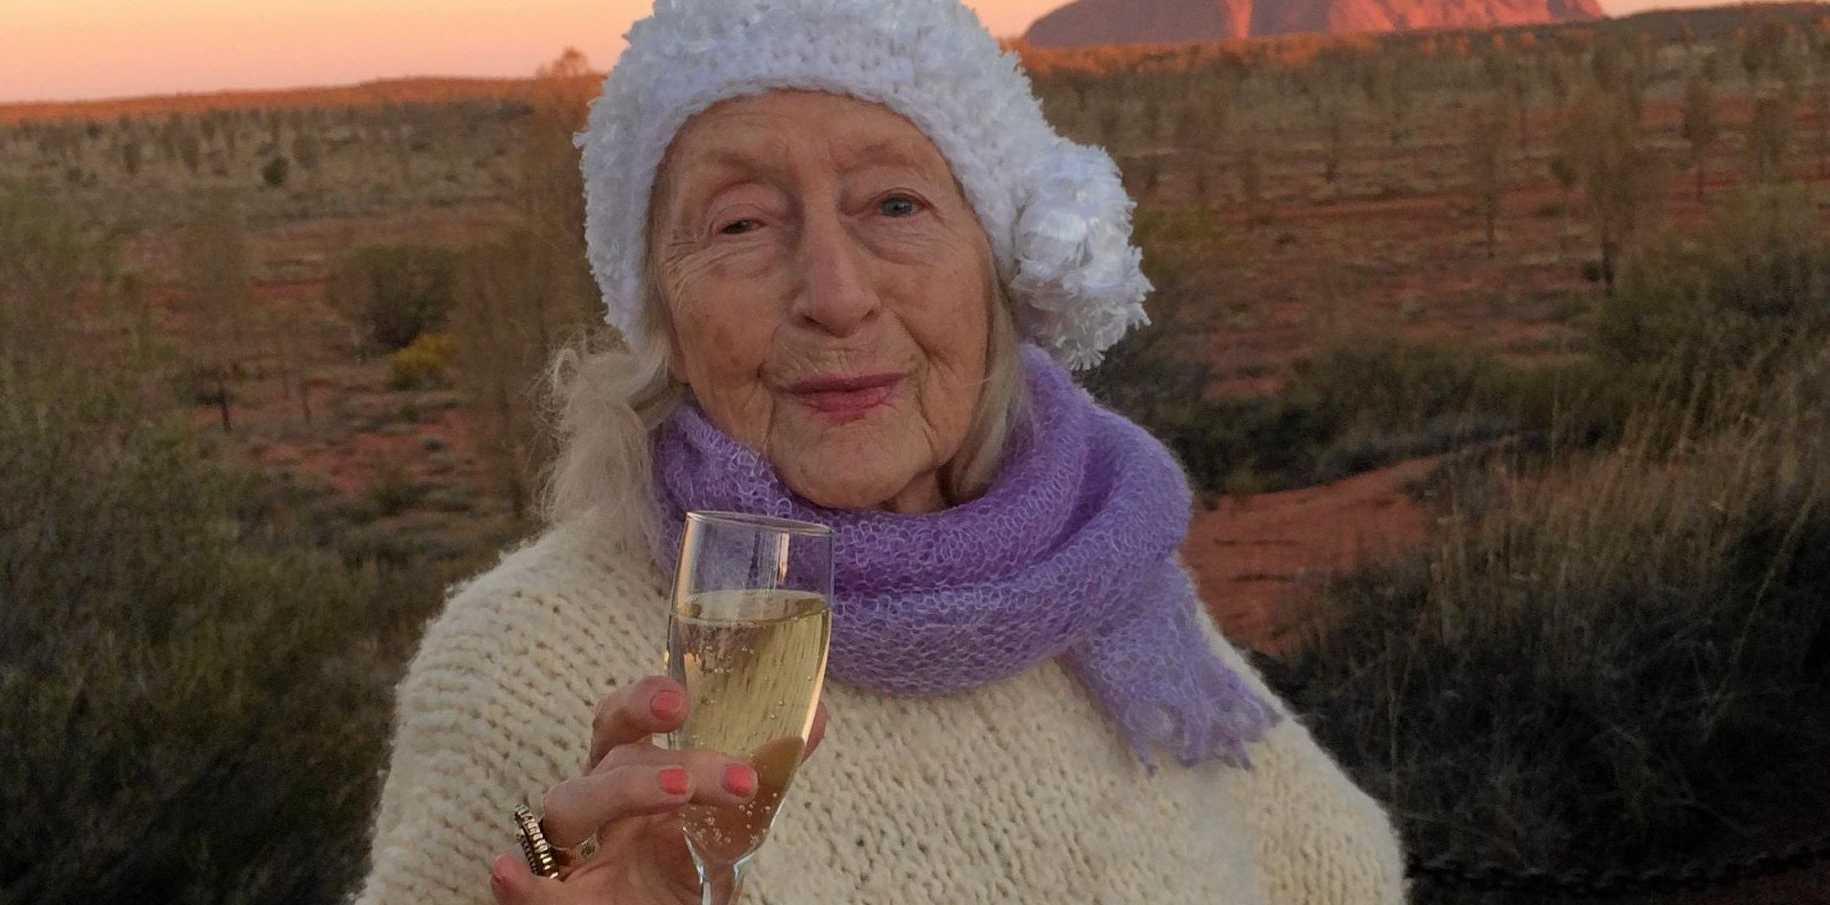 FULL OF LIFE: Eileen Kramer is hip and groovy enjoying the stunning Uluru sunset.